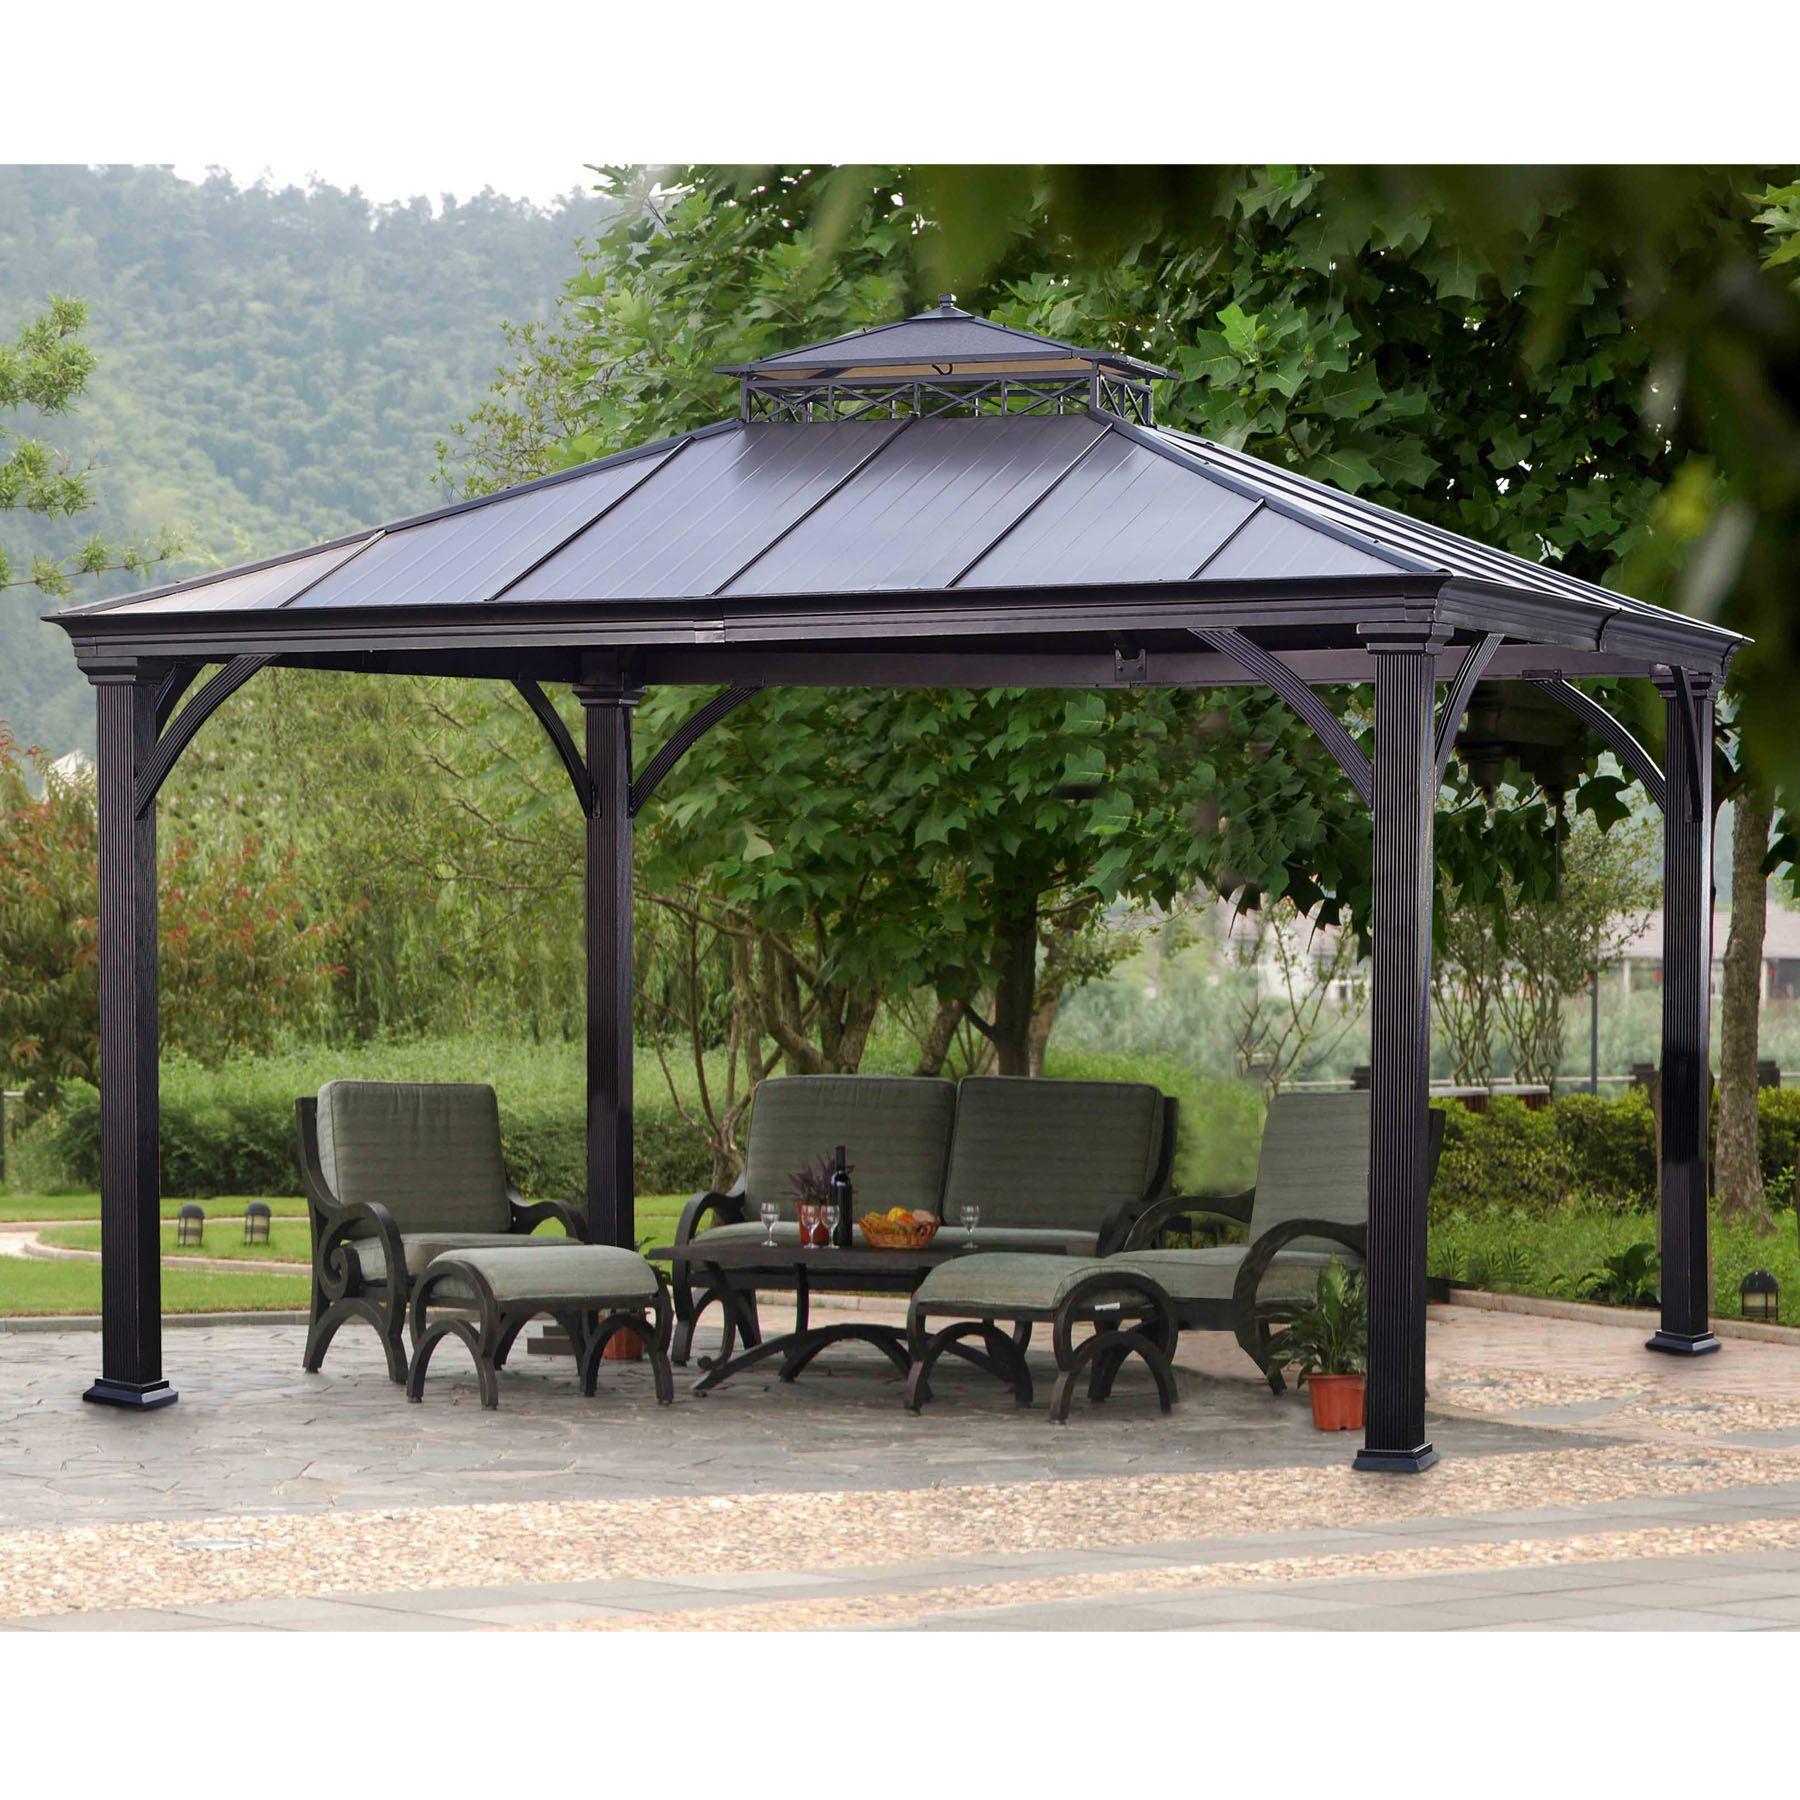 Sunjoy Deerfield Gazebo Outdoor Living Gazebos Canopies